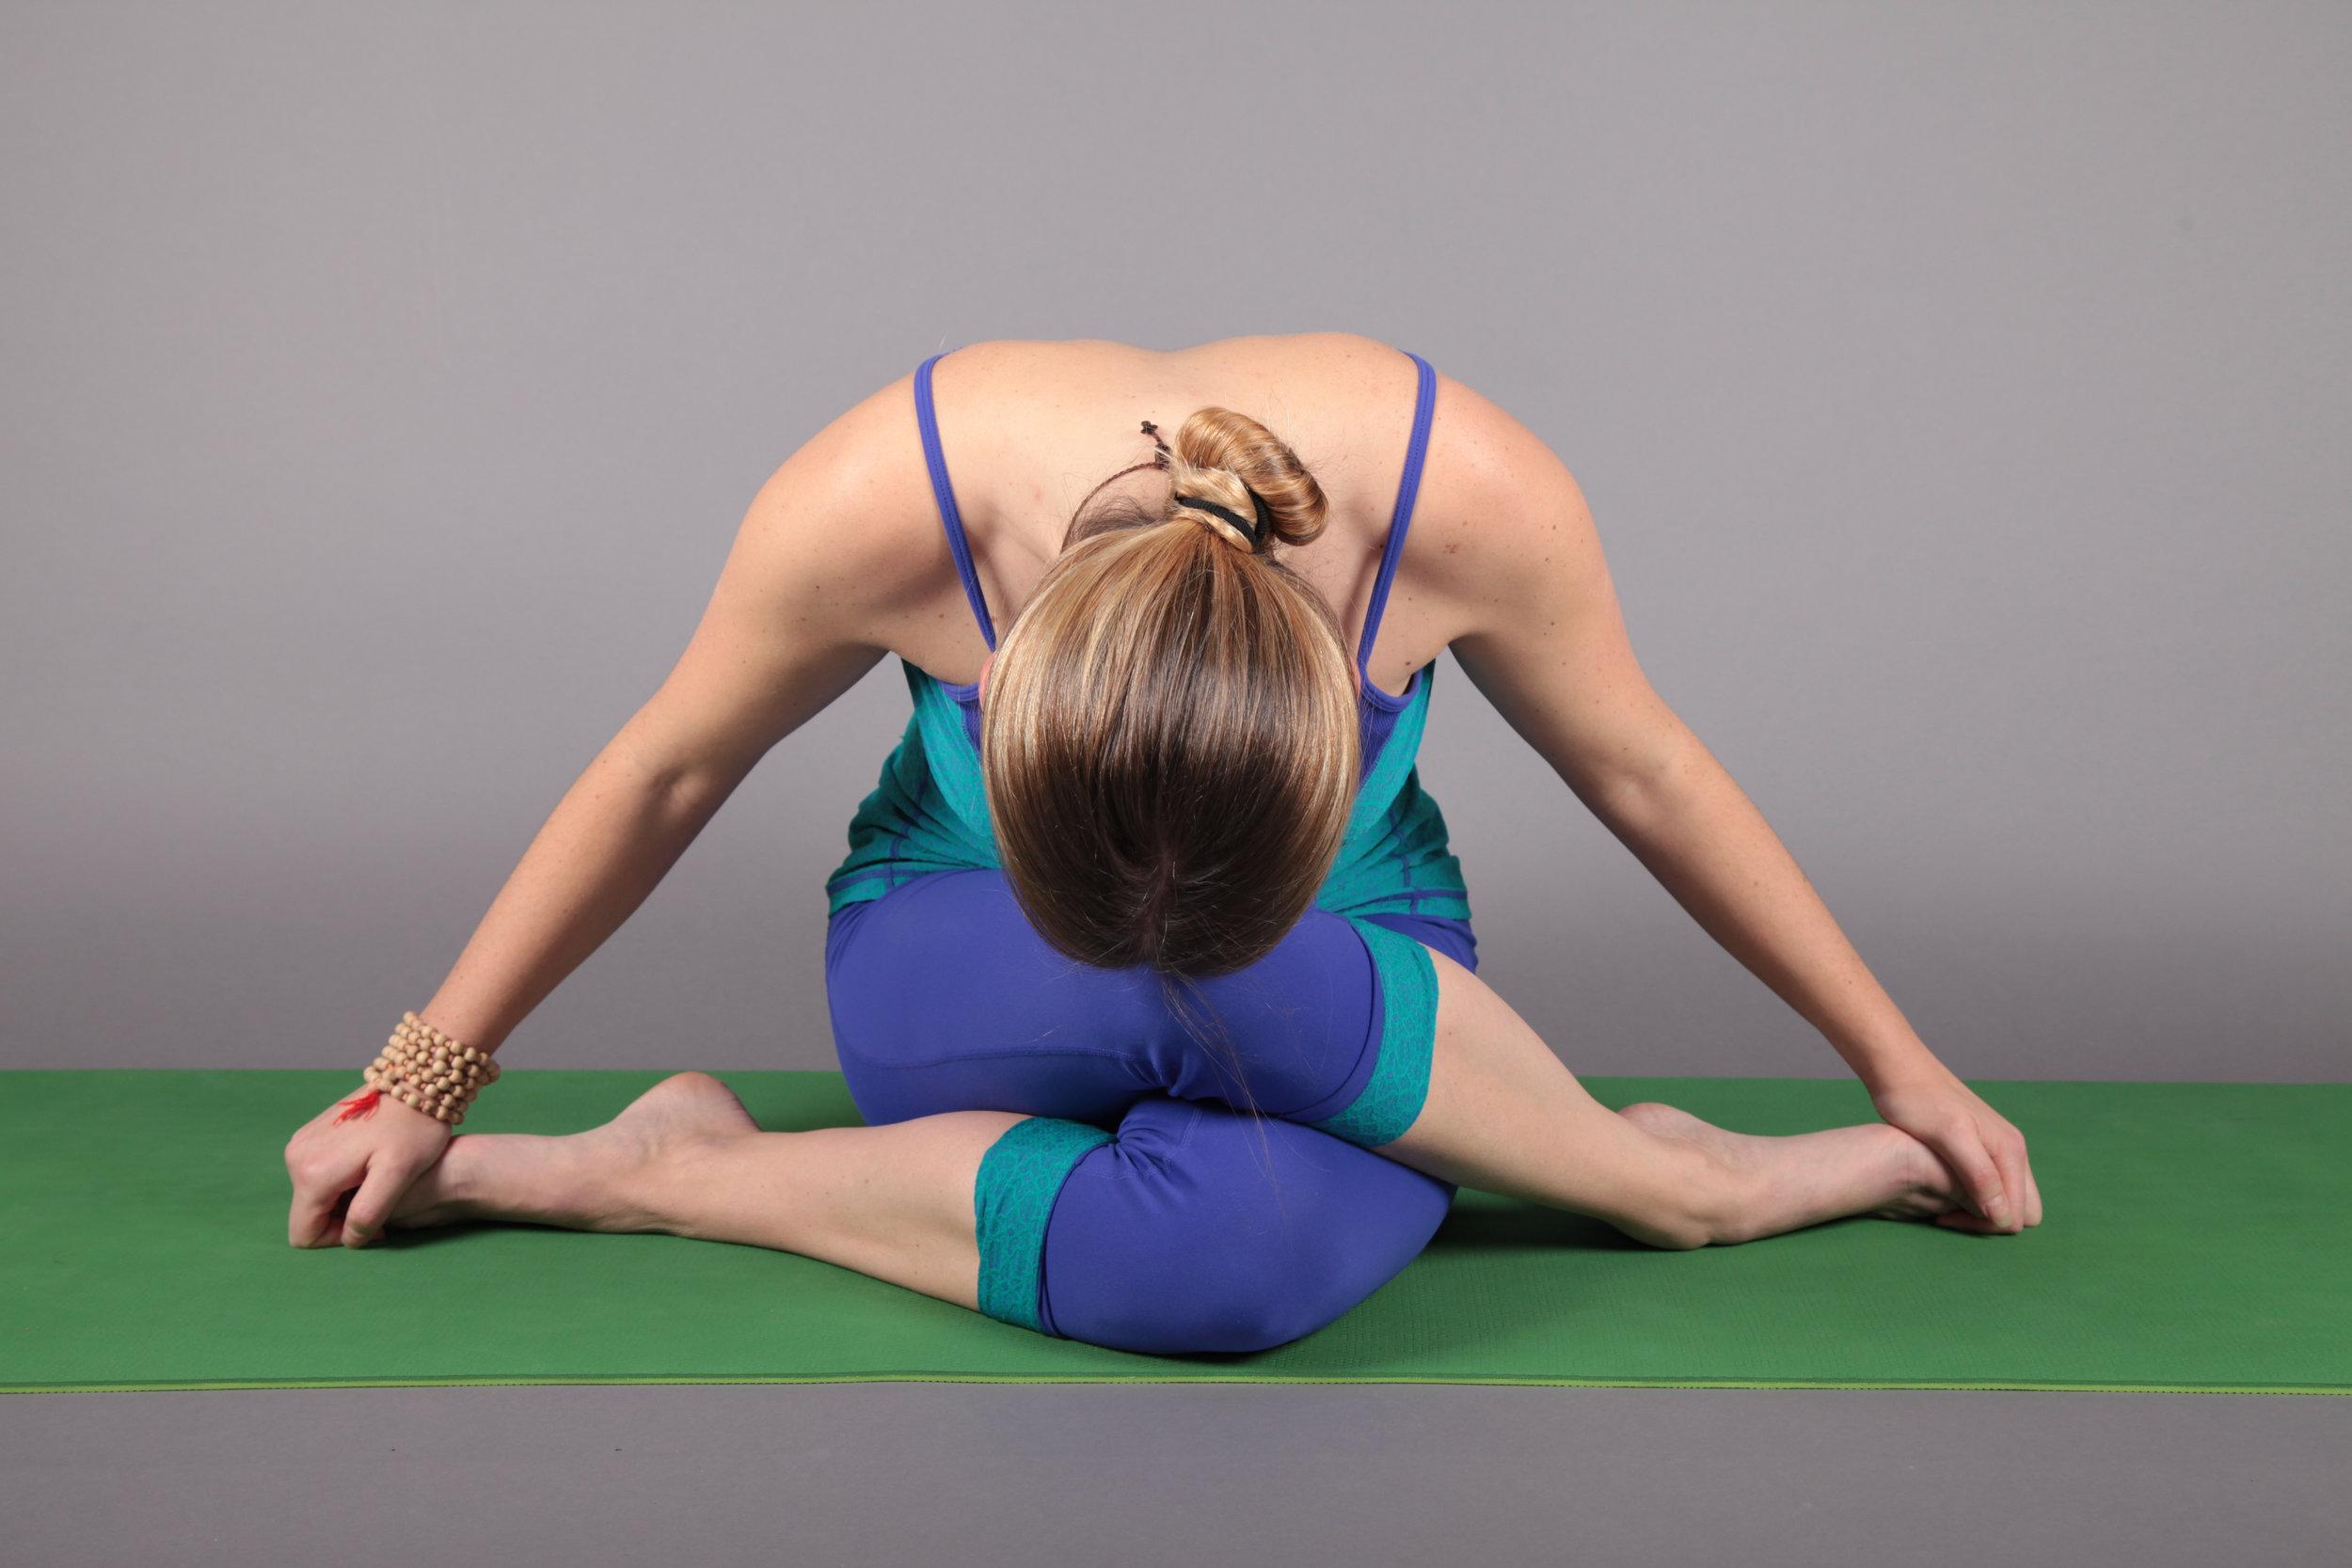 Weekly Open level Yoga classes - Beginner to Intermediate yoga